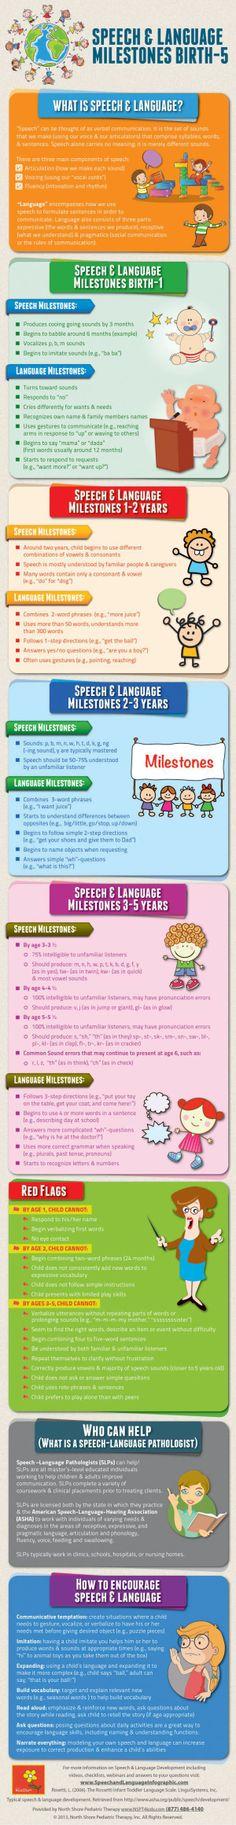 speech & language development & milestones